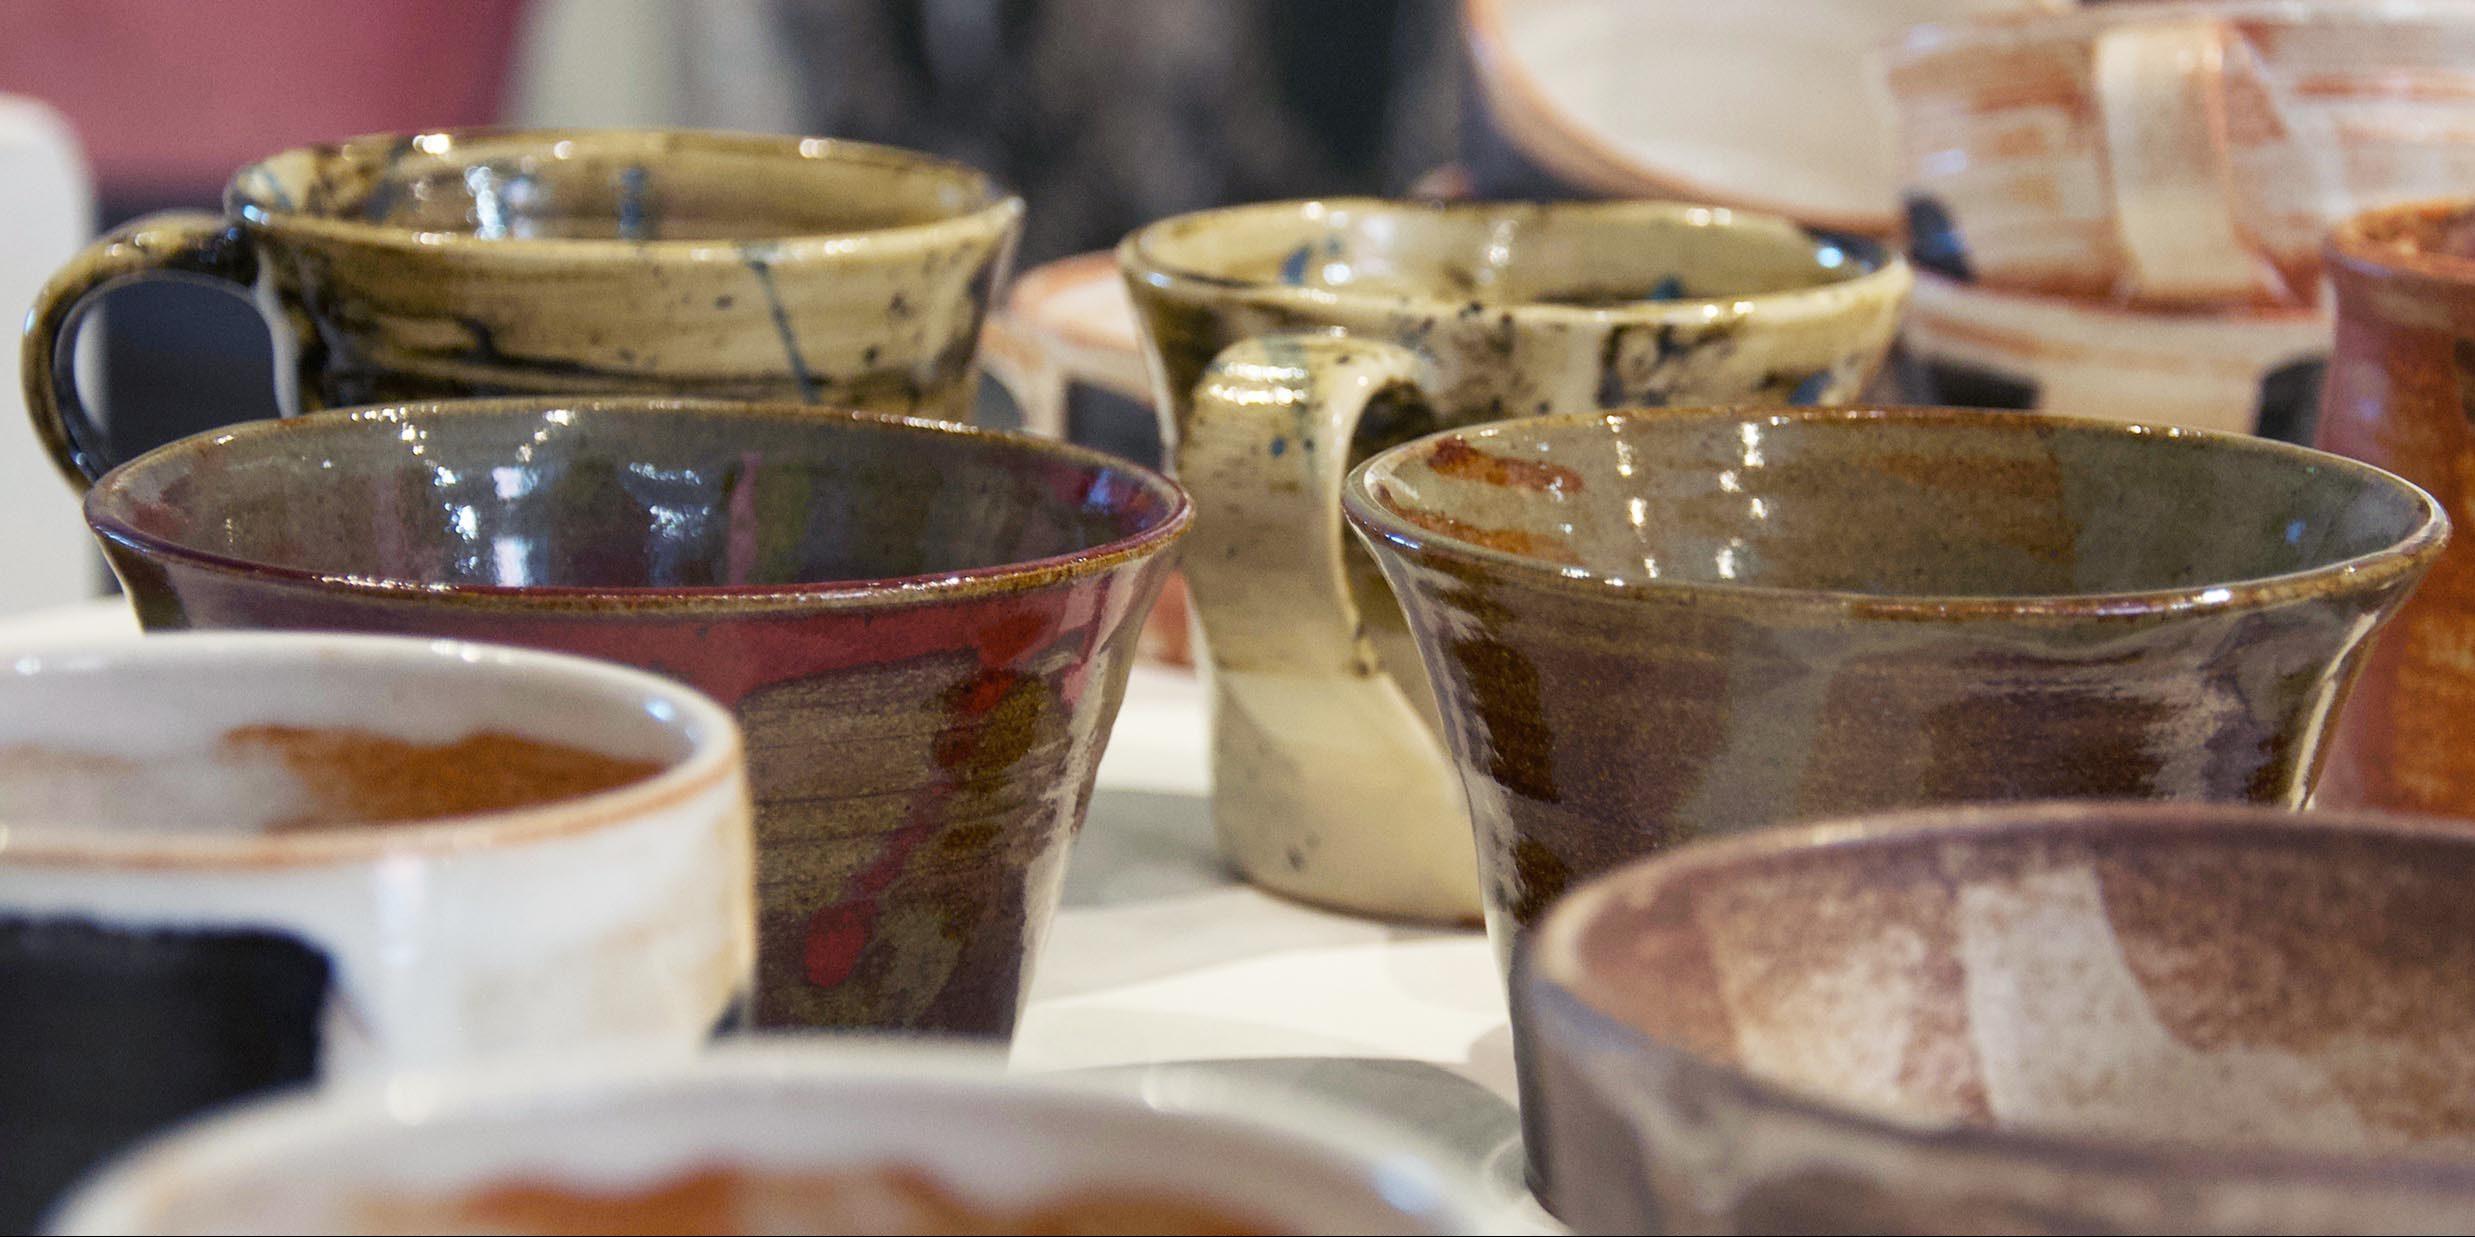 keramik handgjort av formakademin i lidköping